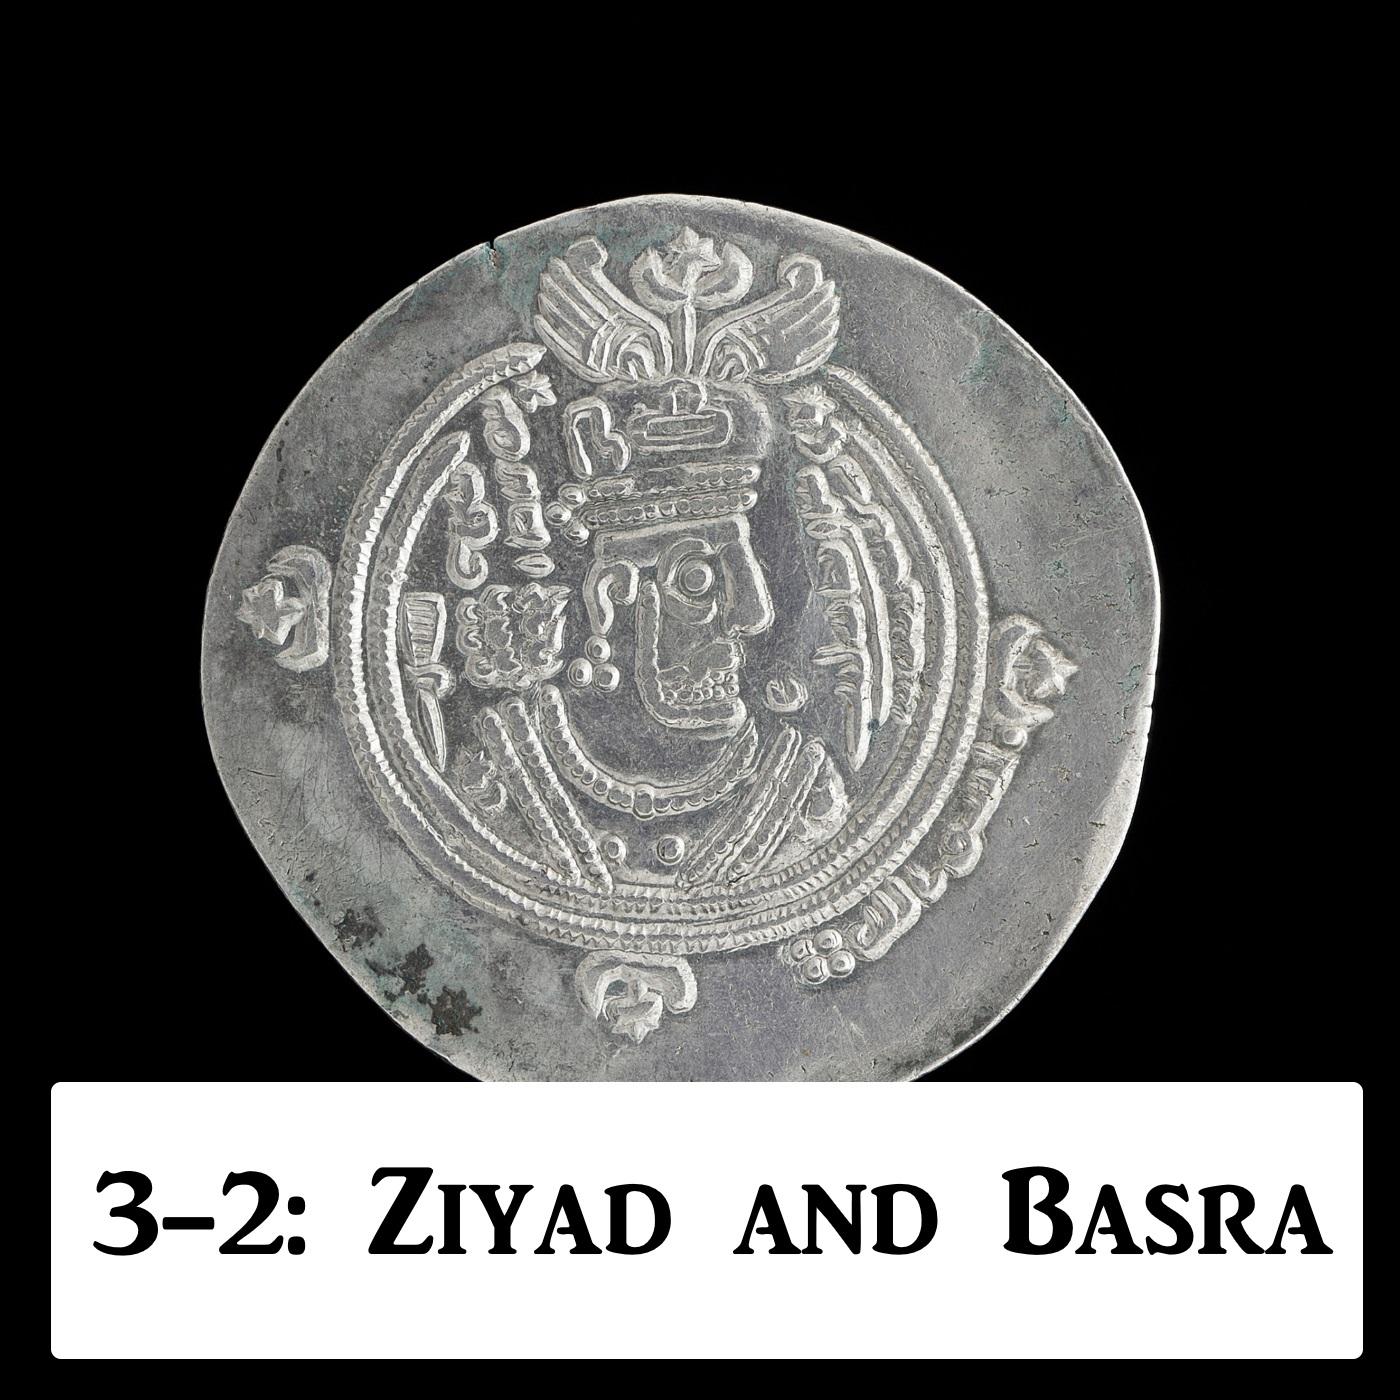 3-2: Muawiyyah And Ziyad